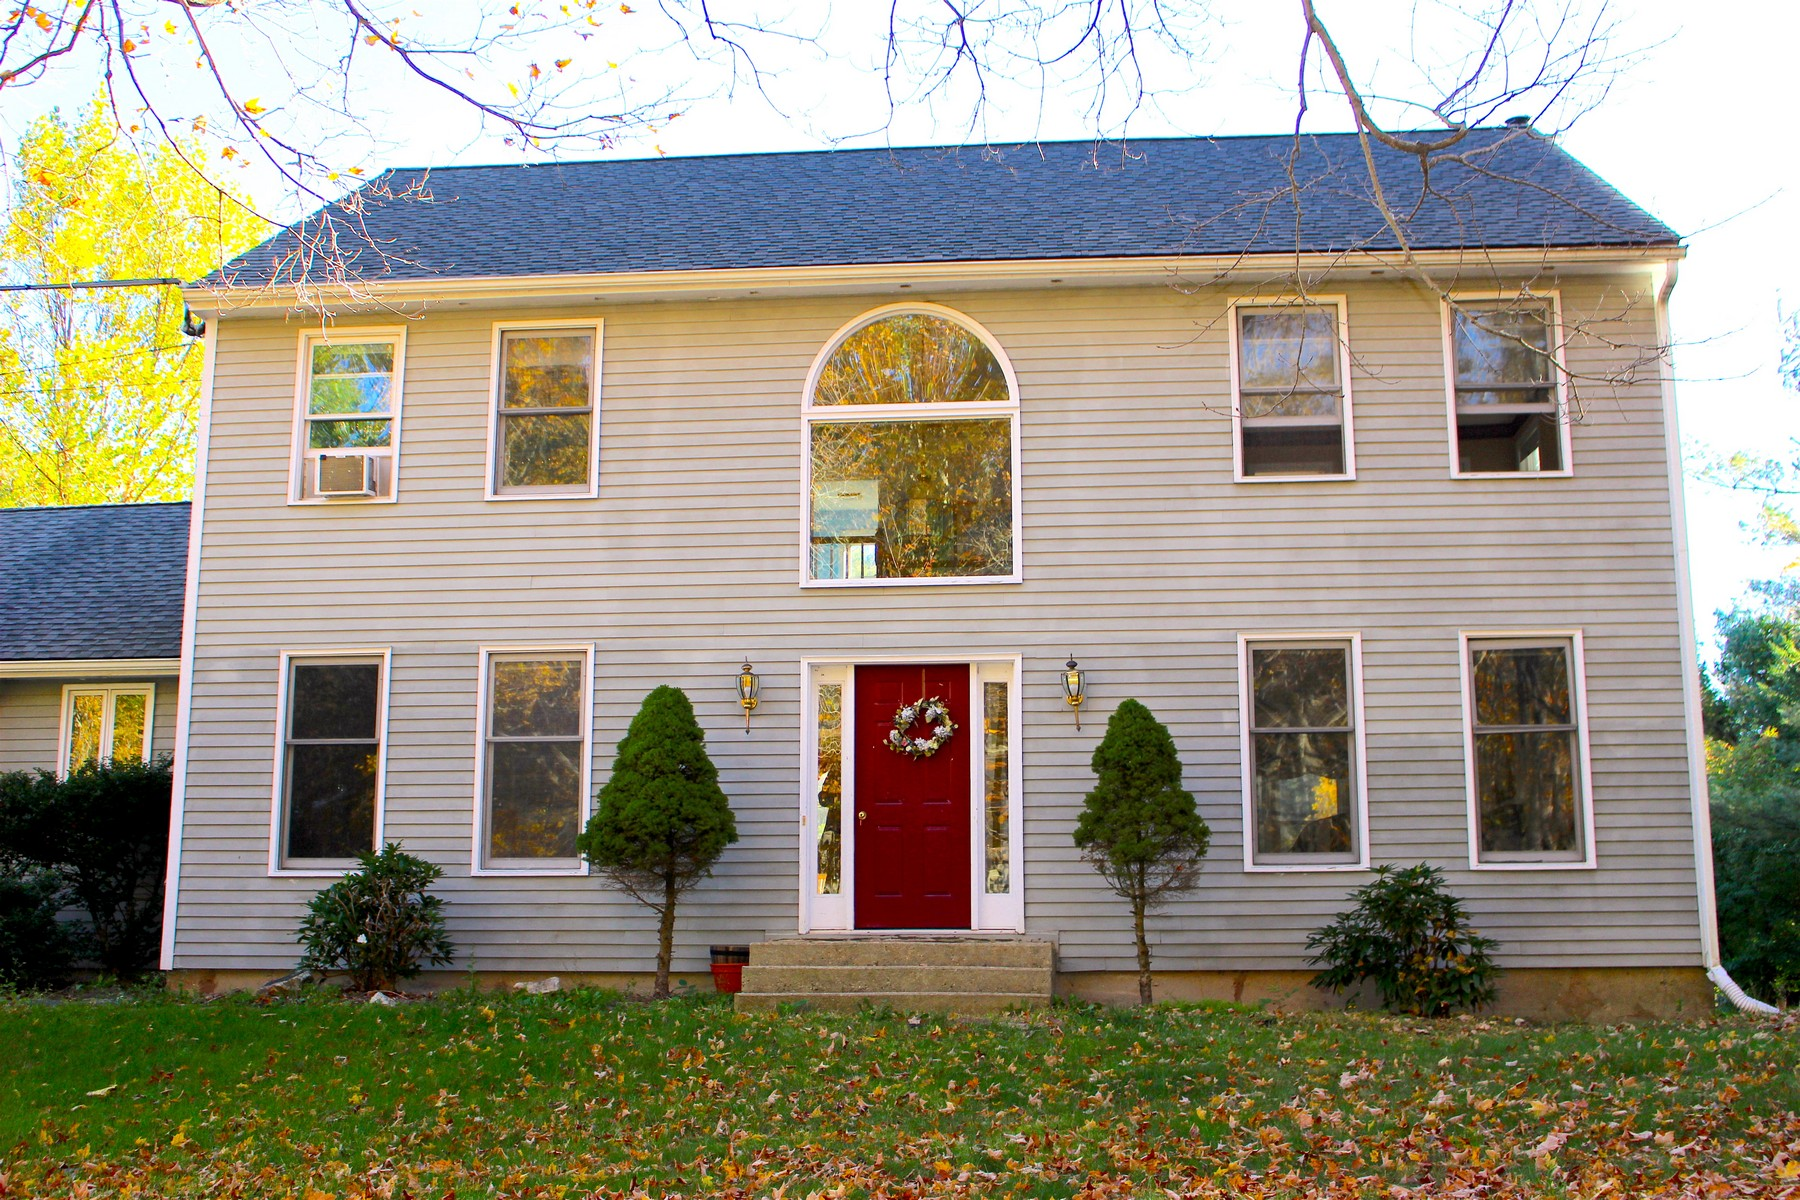 Casa Unifamiliar por un Venta en Custom Center Hall Colonial 421 Old Colchester Rd Hebron, Connecticut, 06231 Estados Unidos